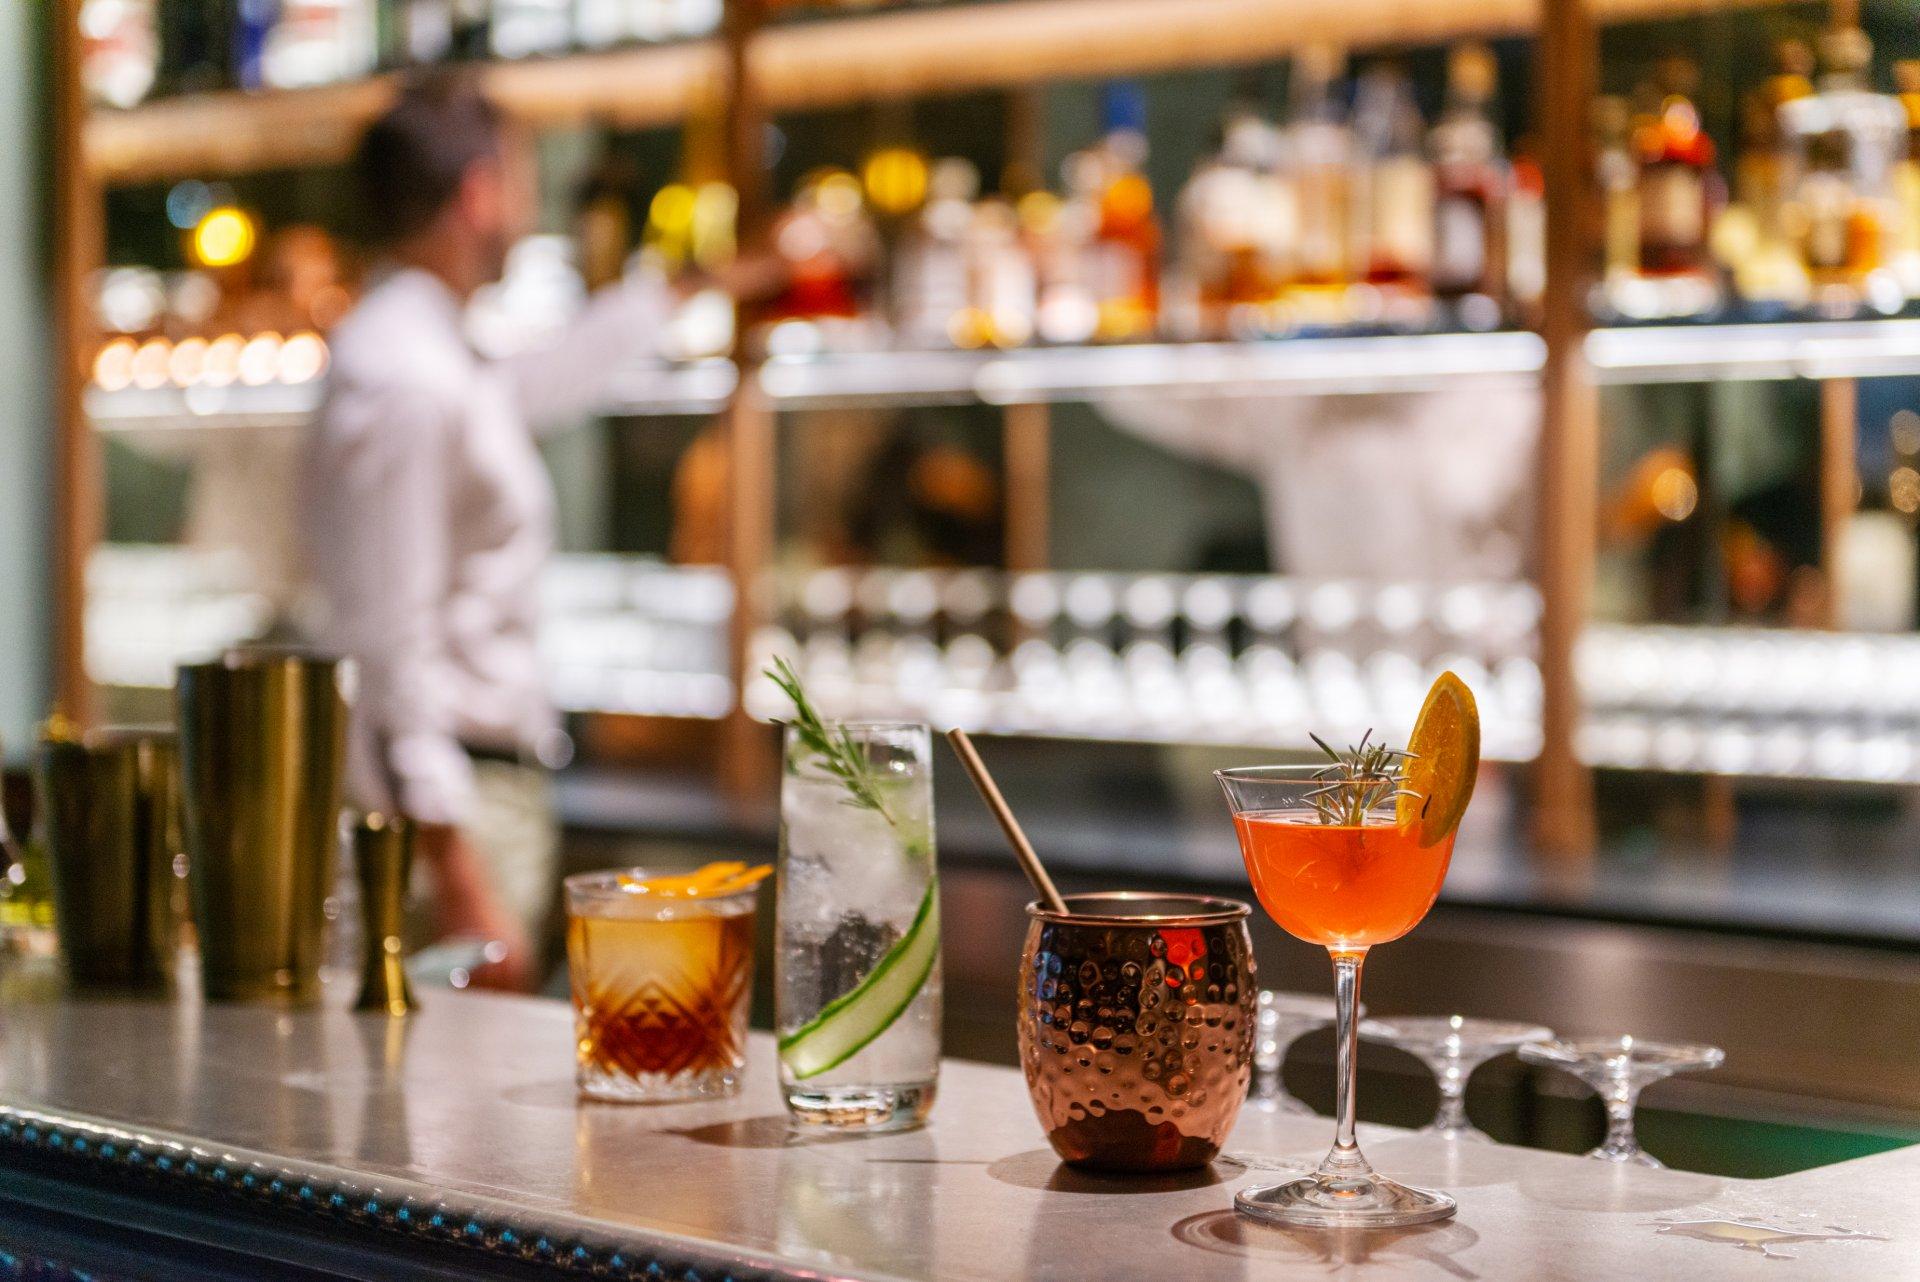 Restaurant Ville d'Avray Le Corot, Les Etangs de Corot